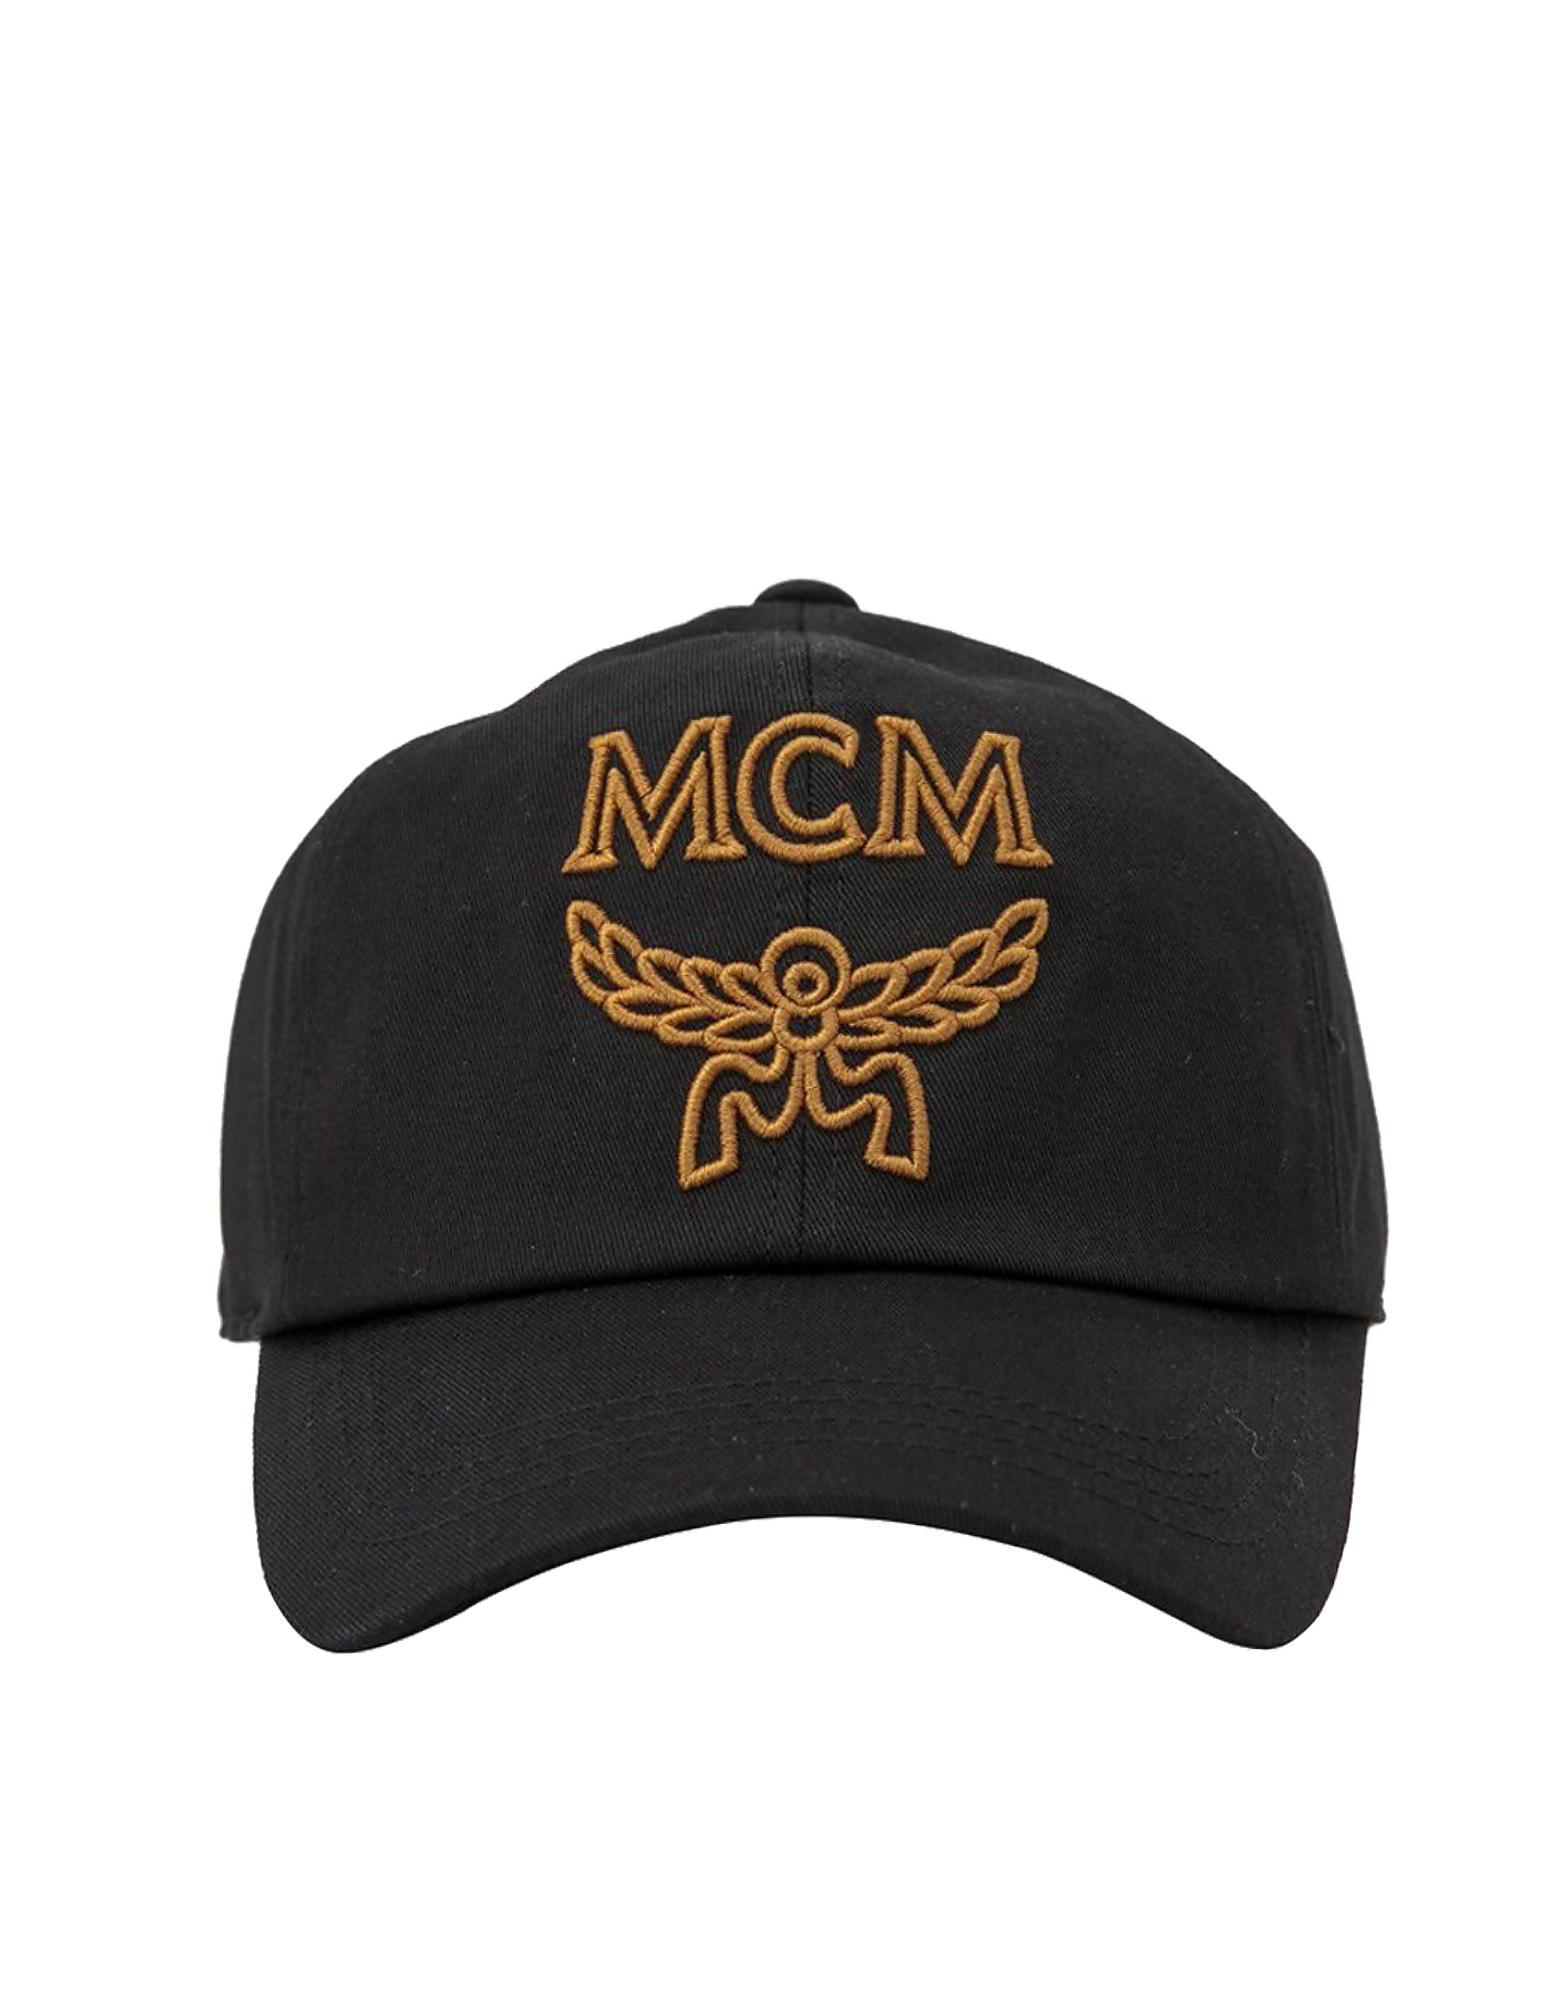 c4fc7cfafc1 MCM - Black Signature Cotton Baseball Cap for Men - Lyst. View fullscreen